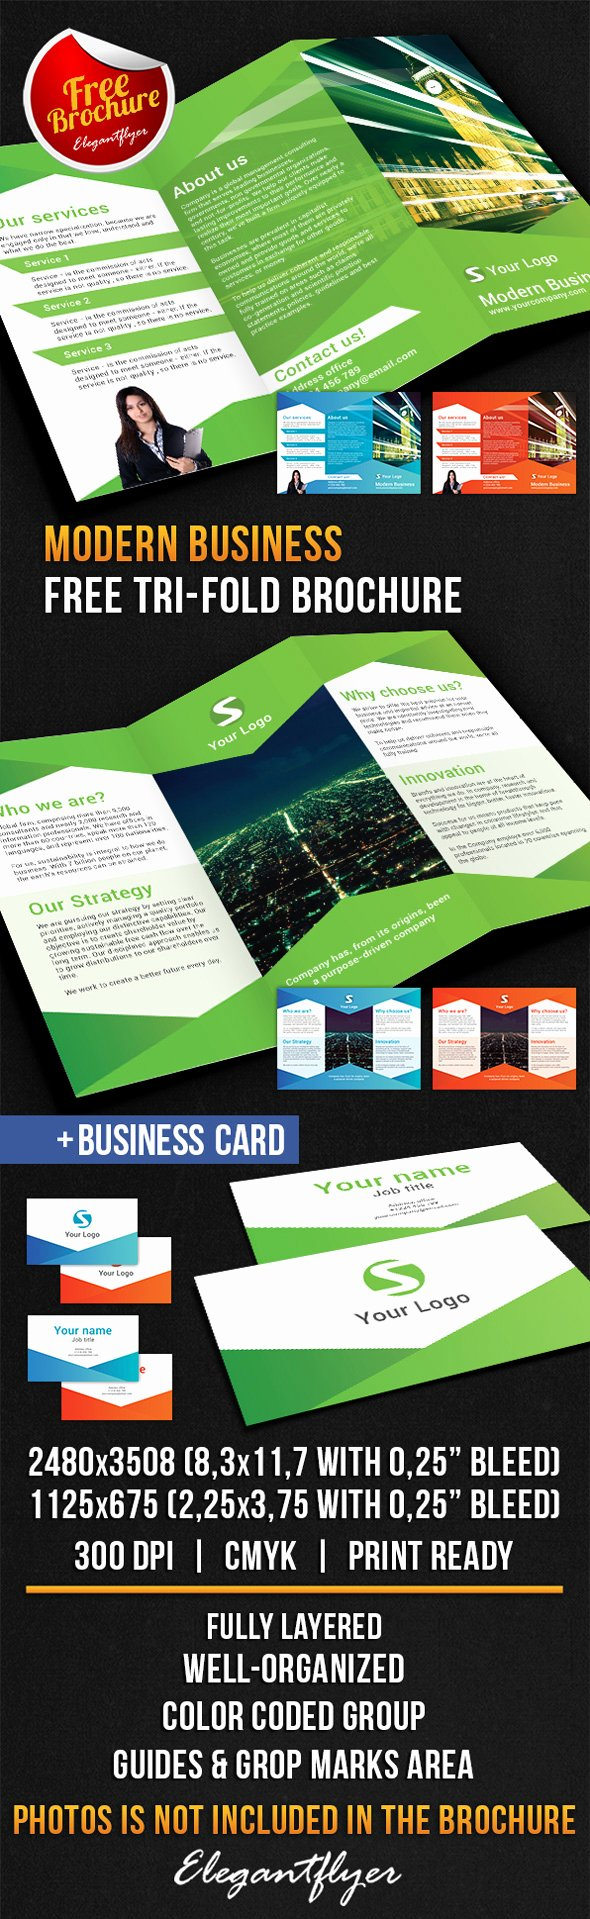 25 Best Free Psd Brochure Templates